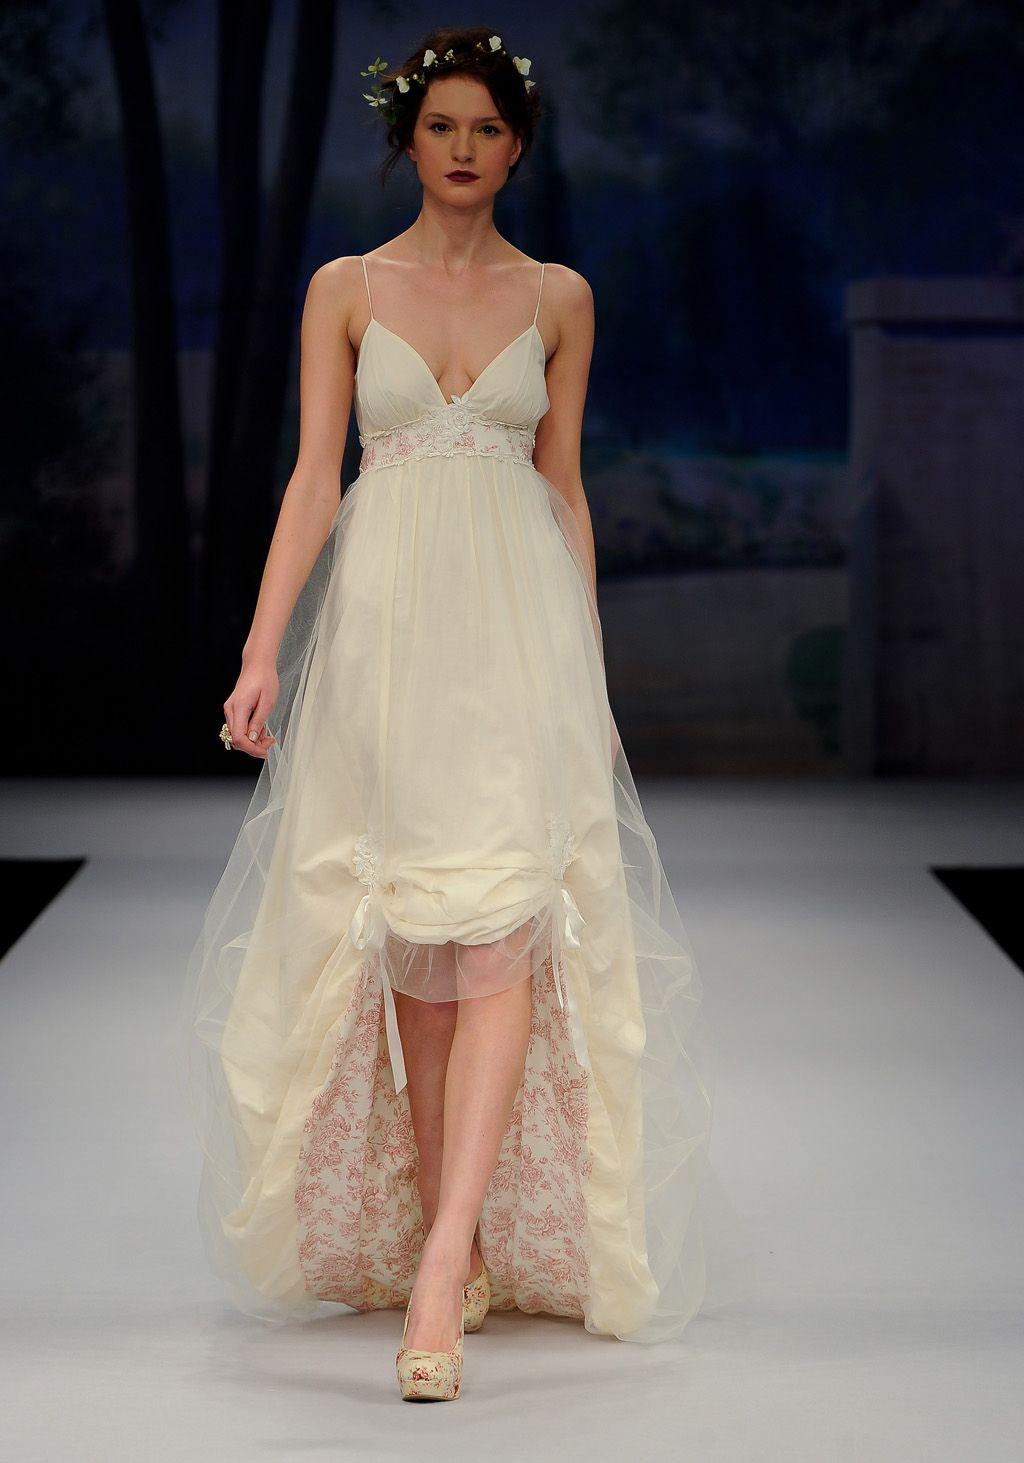 Claire Pettibone Couture Bridal L Wedding Dresses Gowns Fashion Designer Veils Accessories